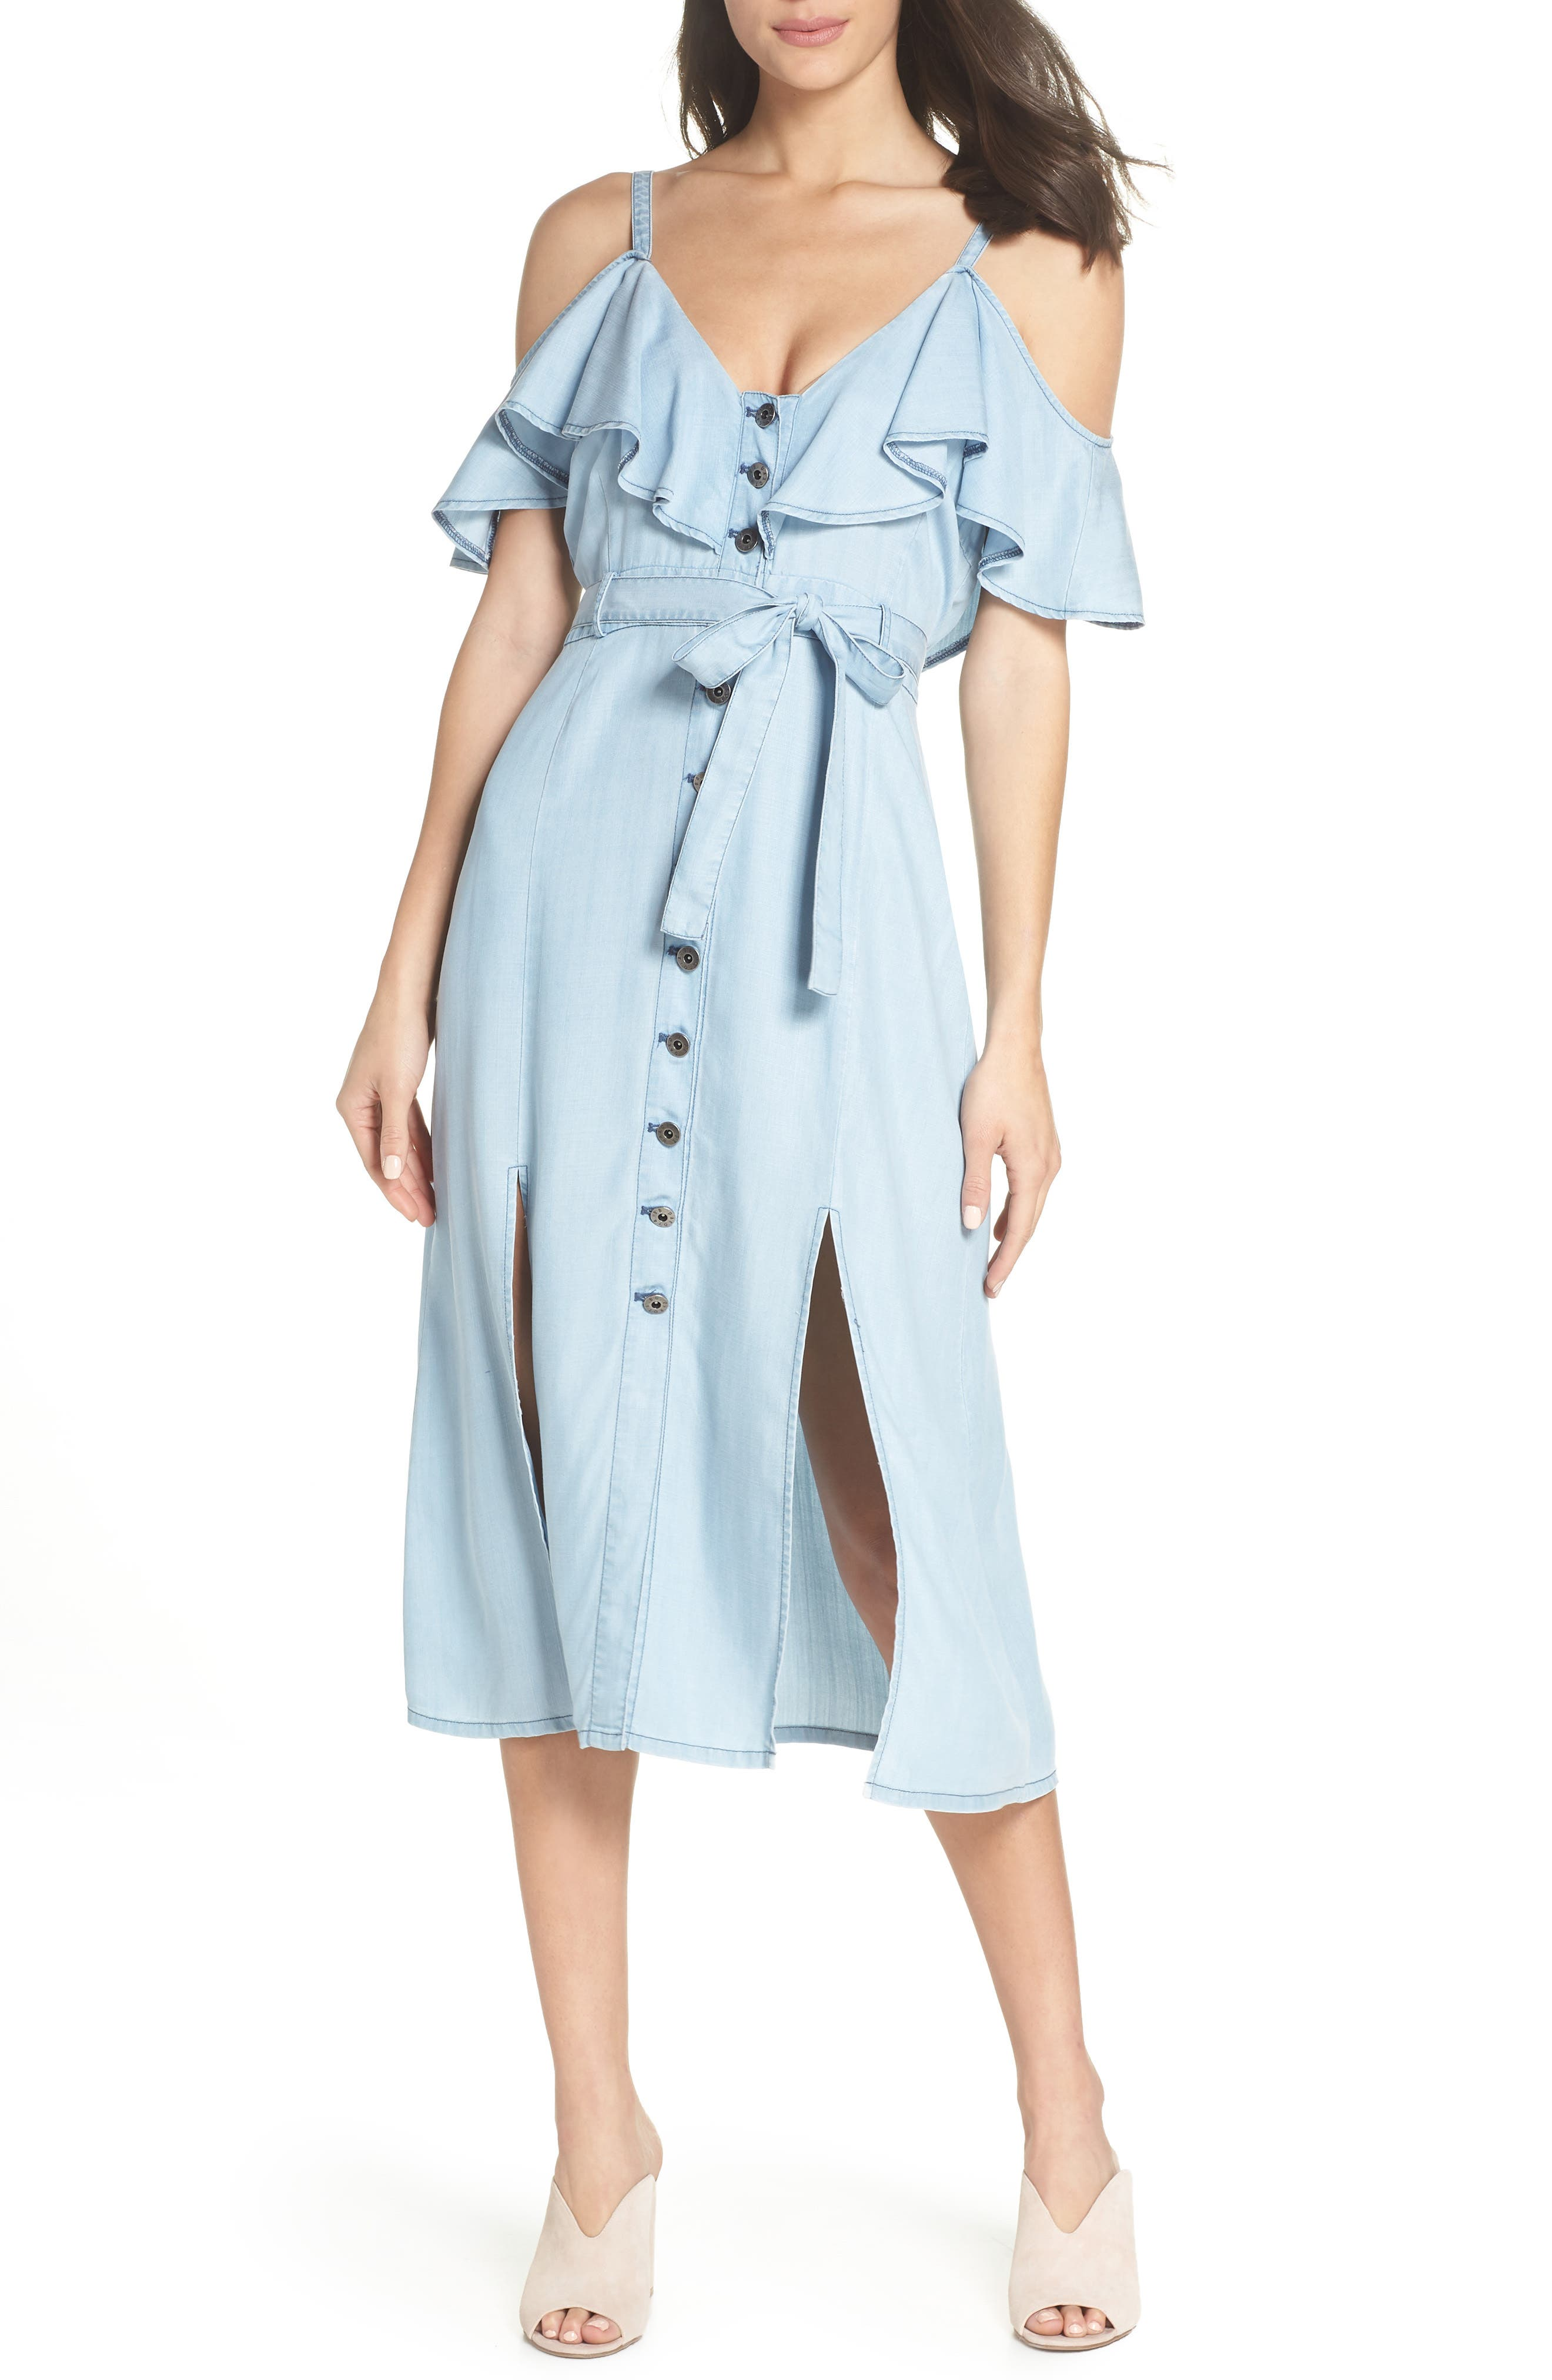 Caite Chambray Cold Shoulder Dress by Bb Dakota